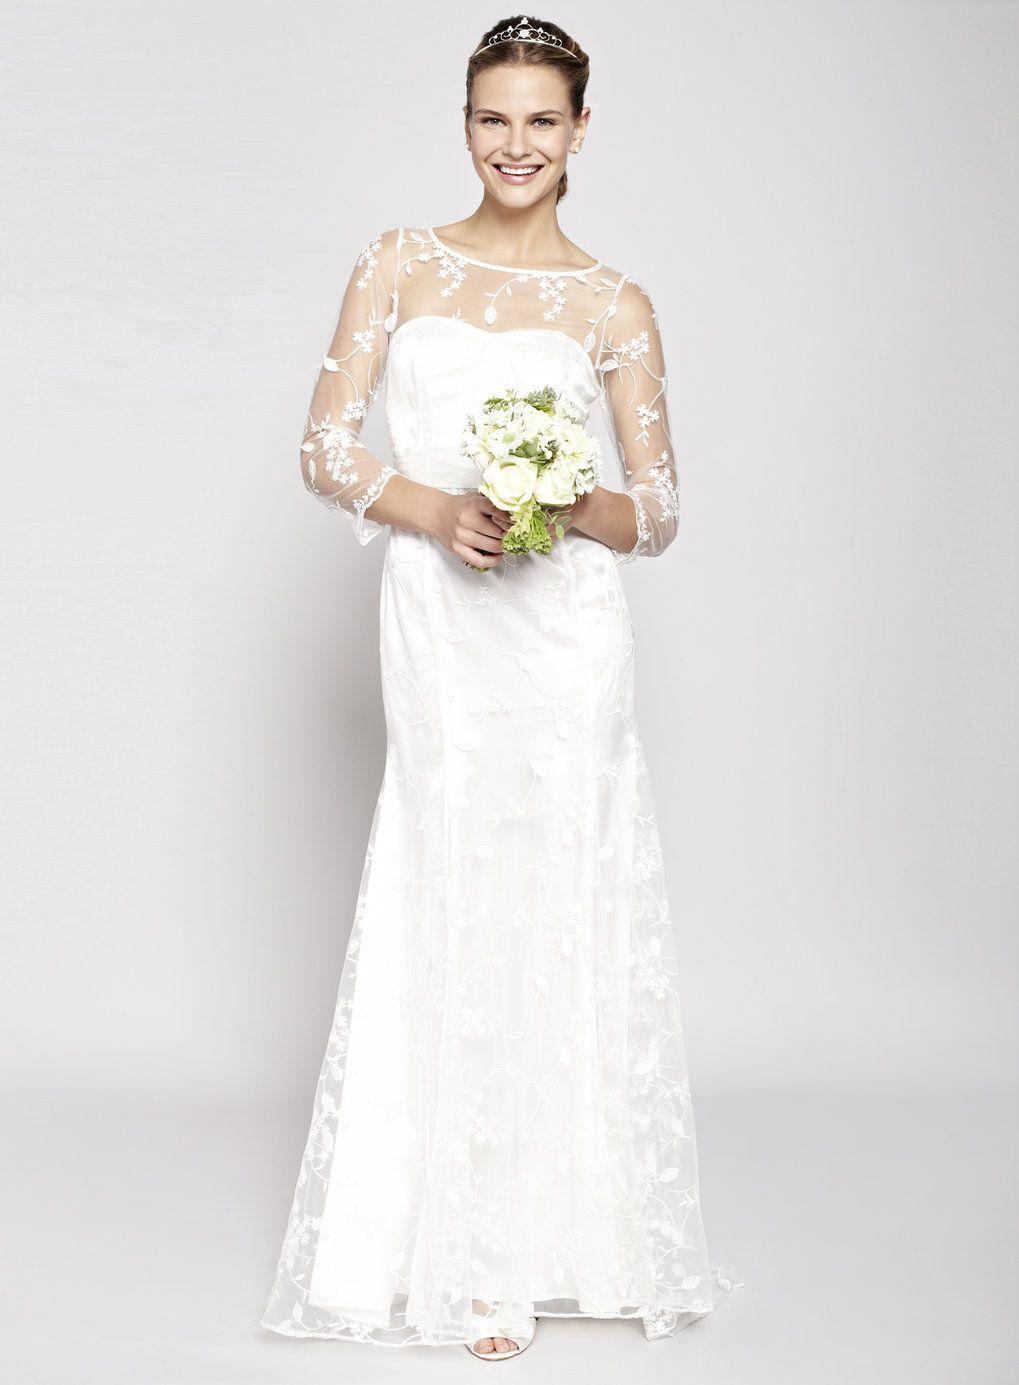 Ivory violet wedding dress wedding dress pinterest wedding ivory violet wedding dress ombrellifo Gallery